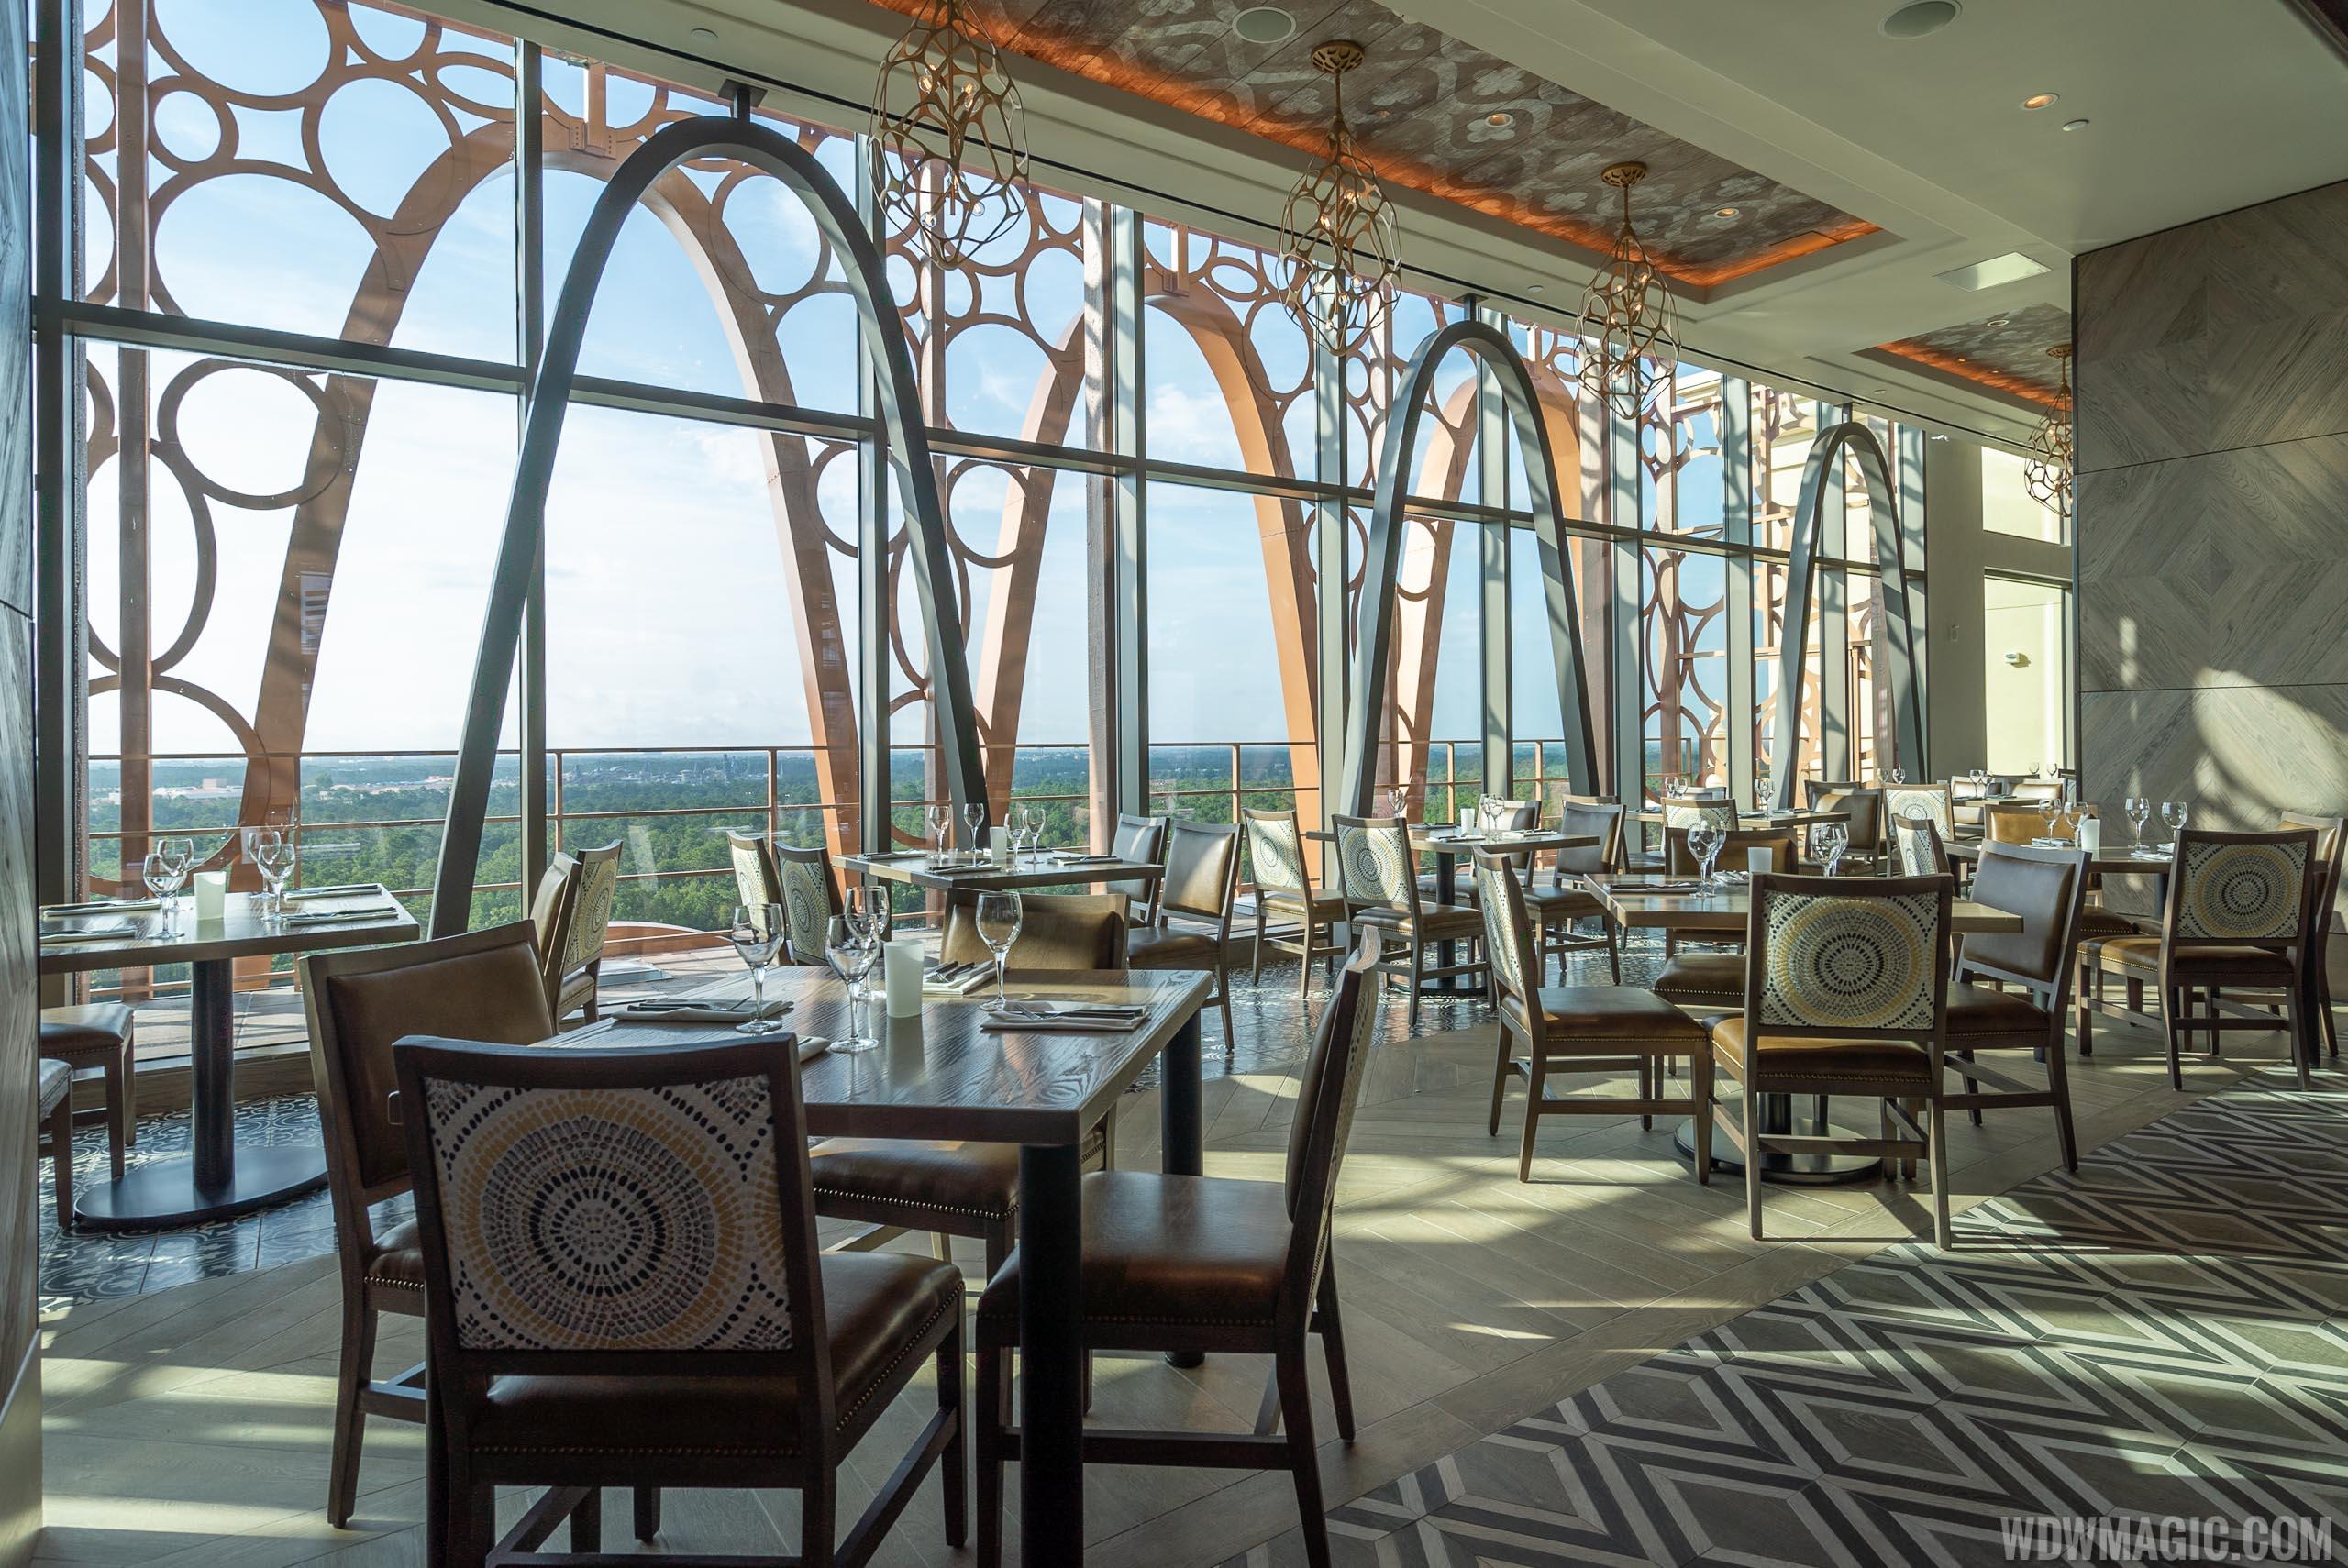 Toledo dining room overview